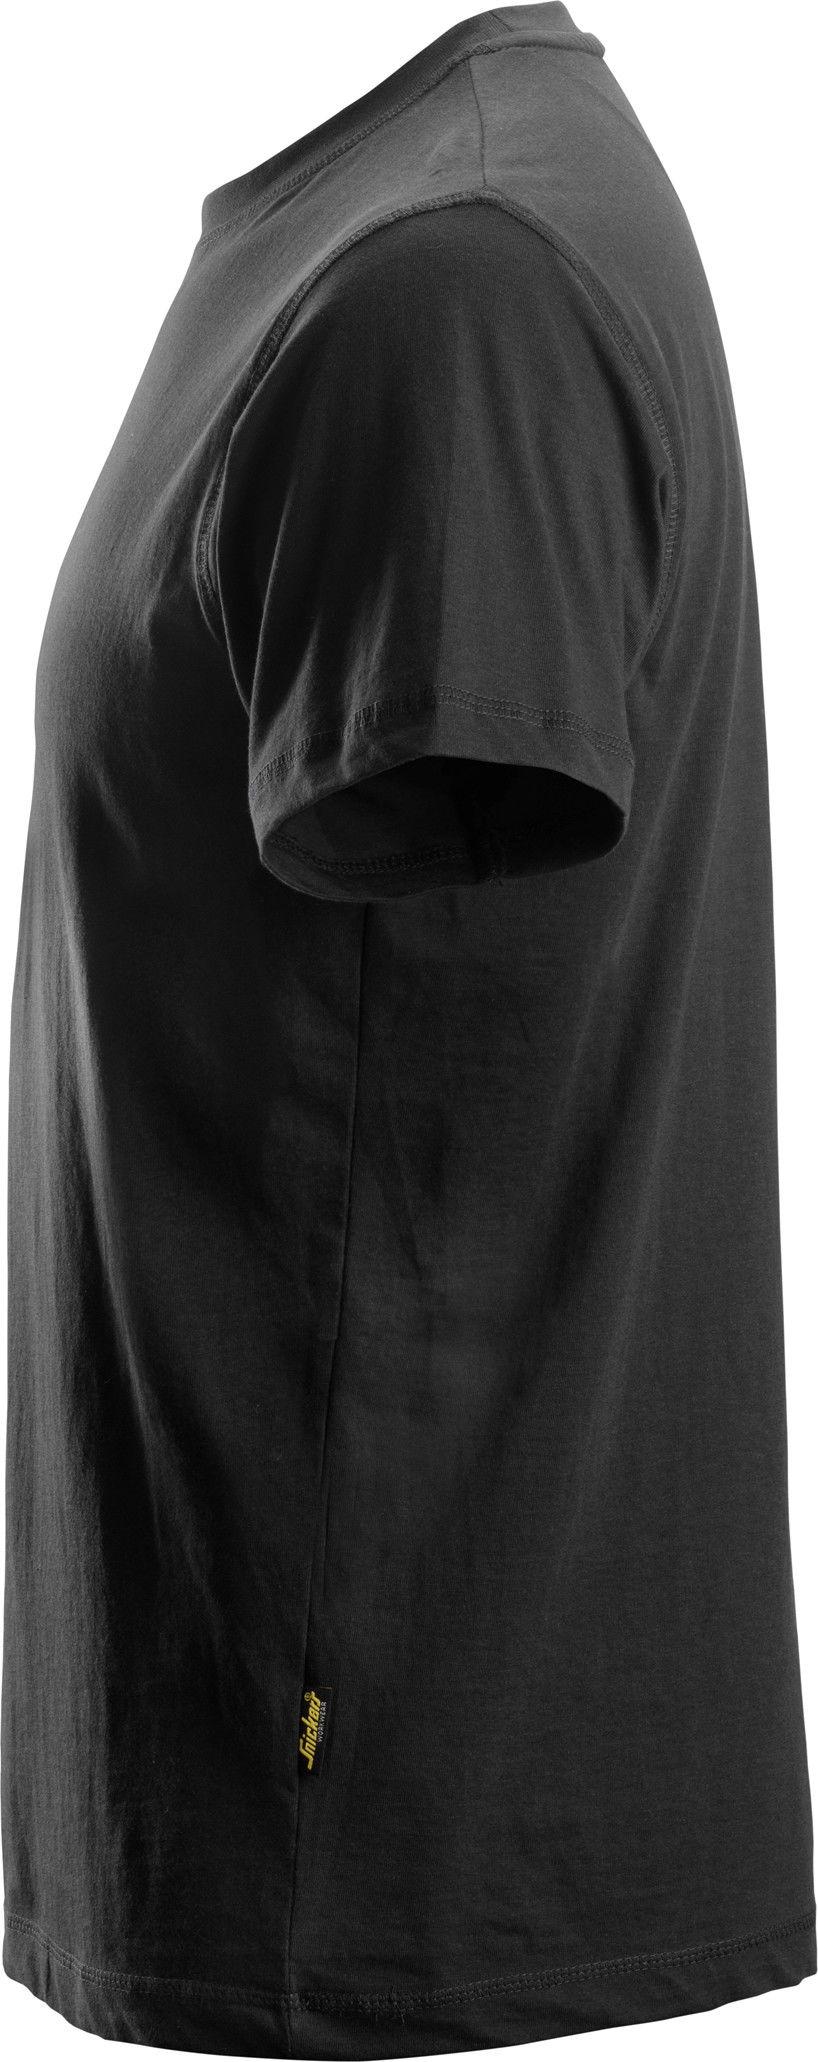 T-shirt koszulka męska, czarna, rozmiar XXL, 2502 Snickers [25020400008]